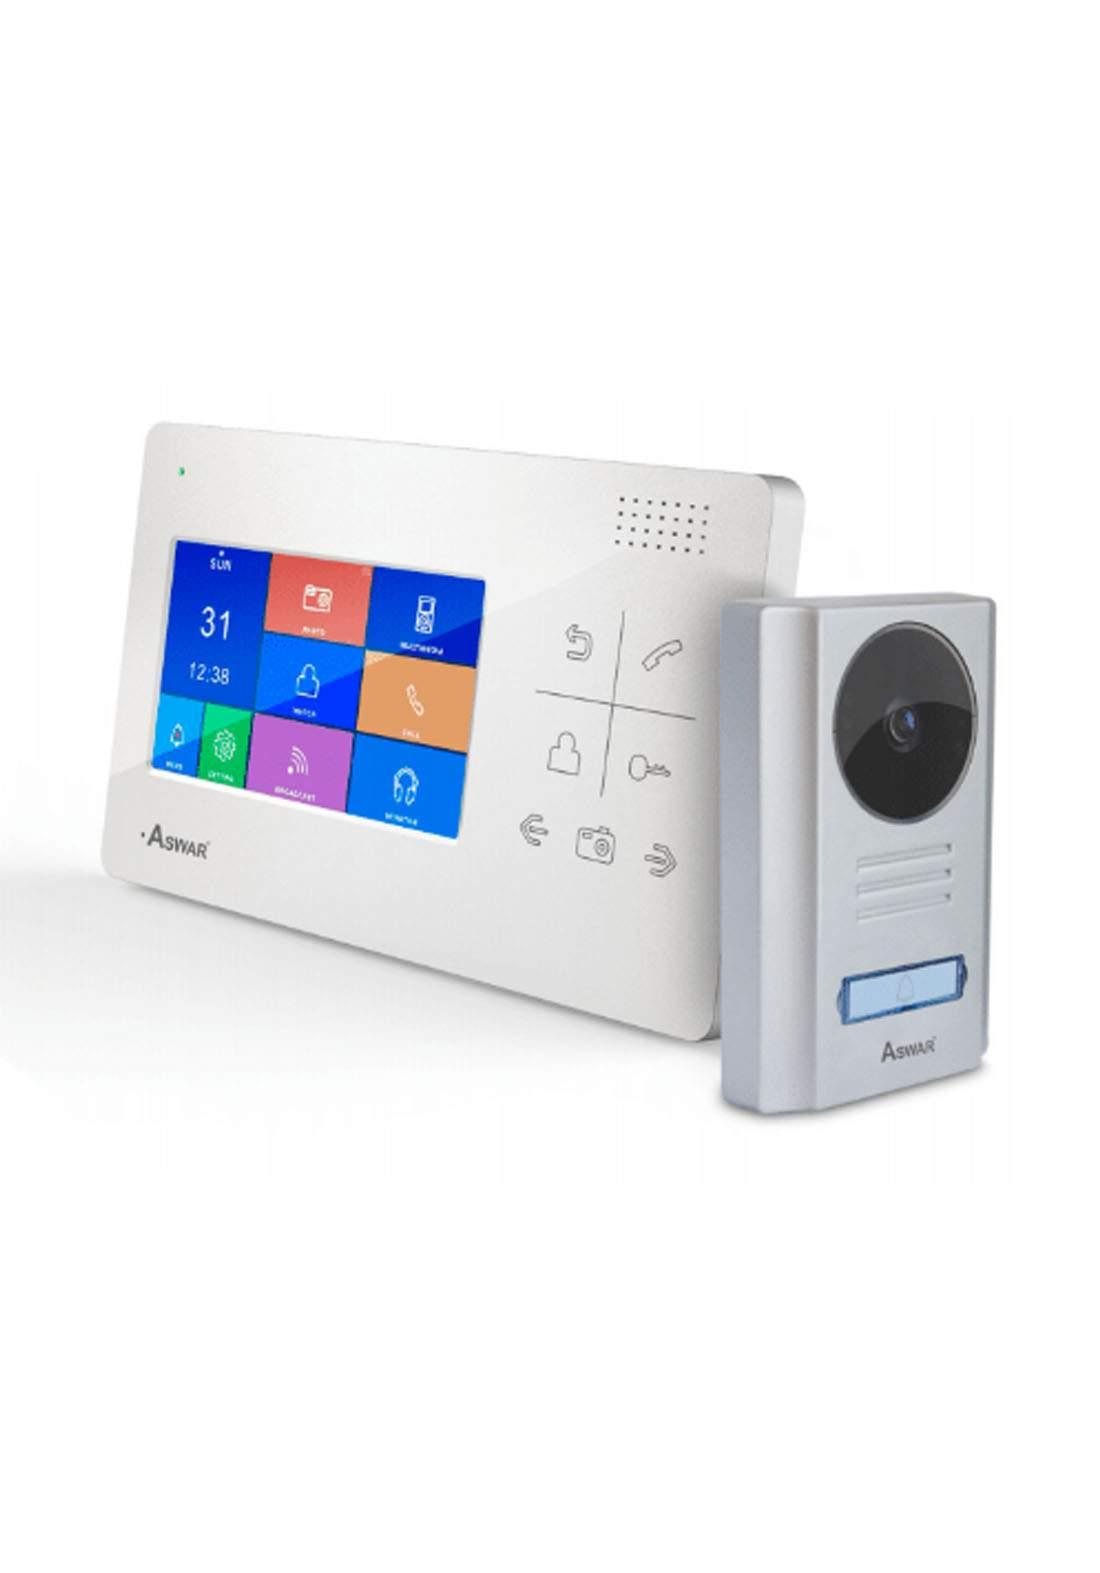 Aswar AS-VDP-40400B Digital LCD Indoor Monitor - Gray شاشة مراقبة للابواب